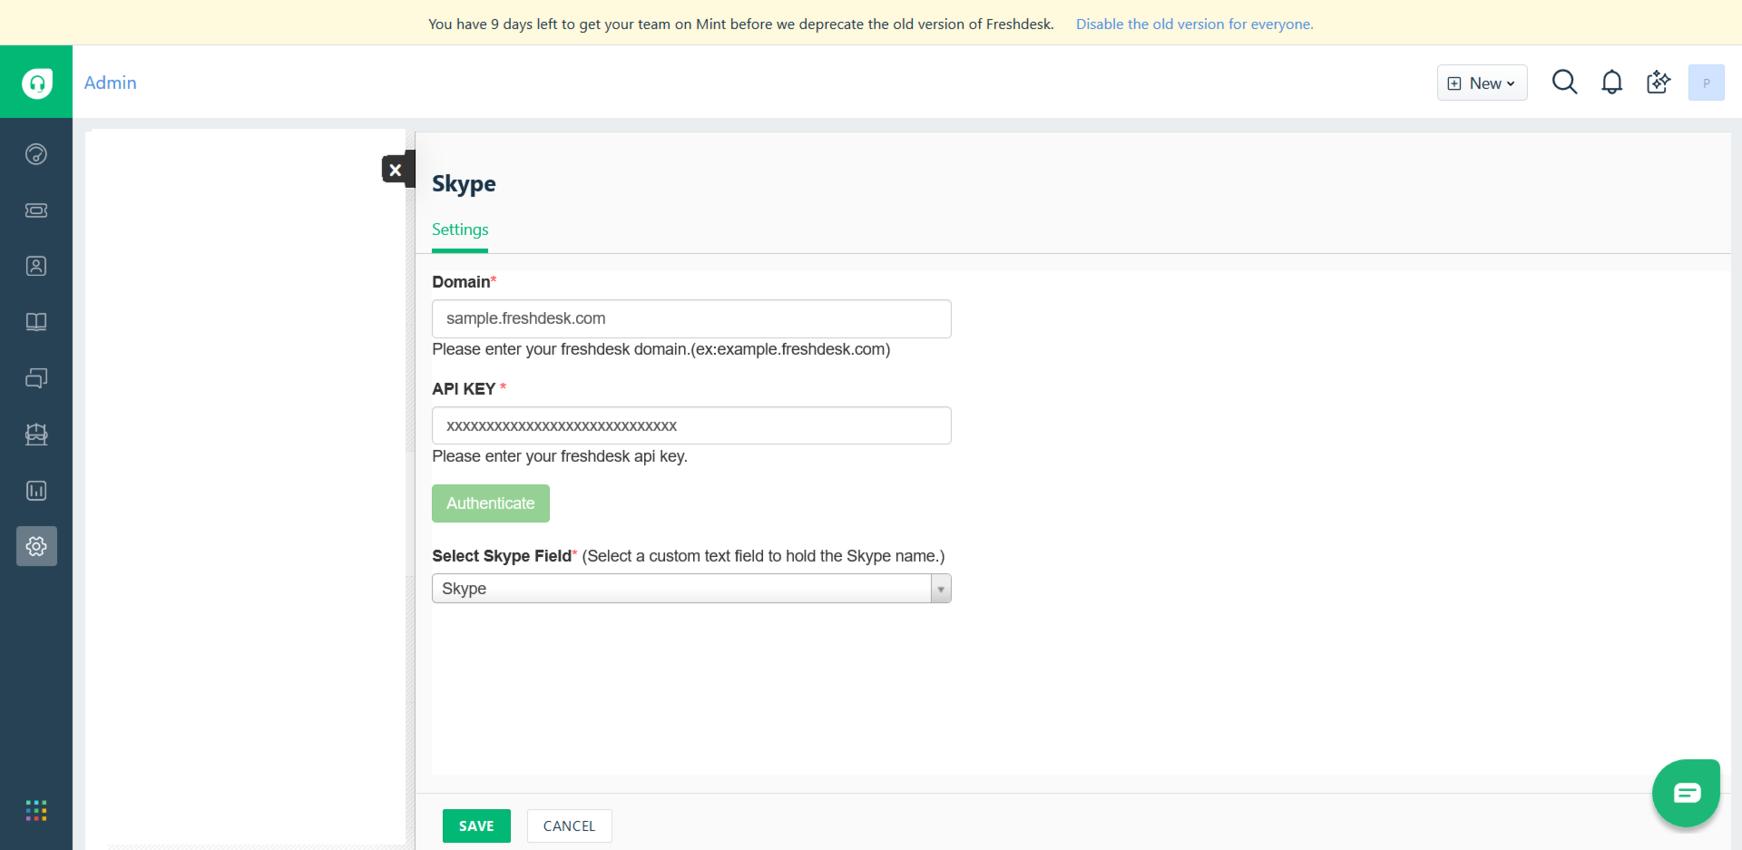 Skype V2 - Freshworks Marketplace